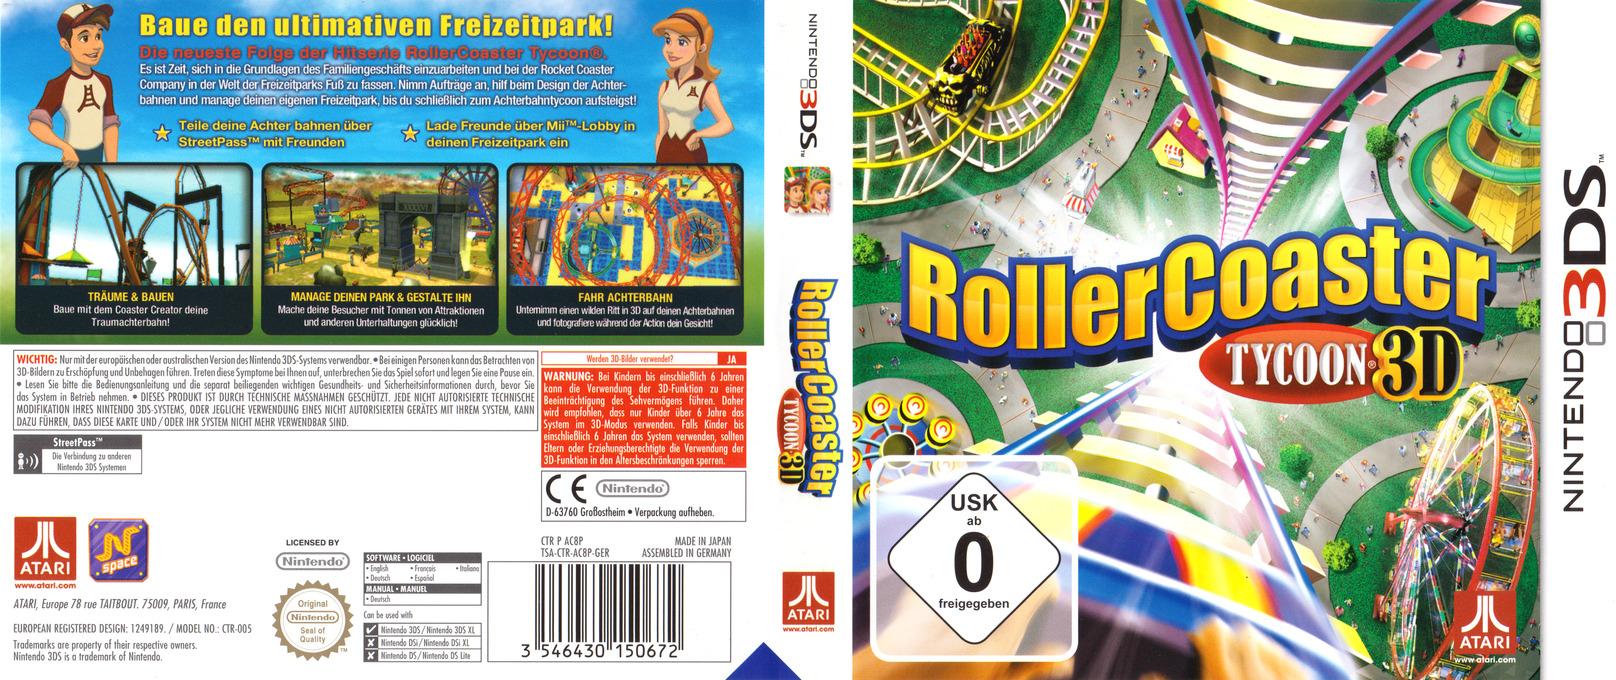 3DS coverfullHQ (AC8P)